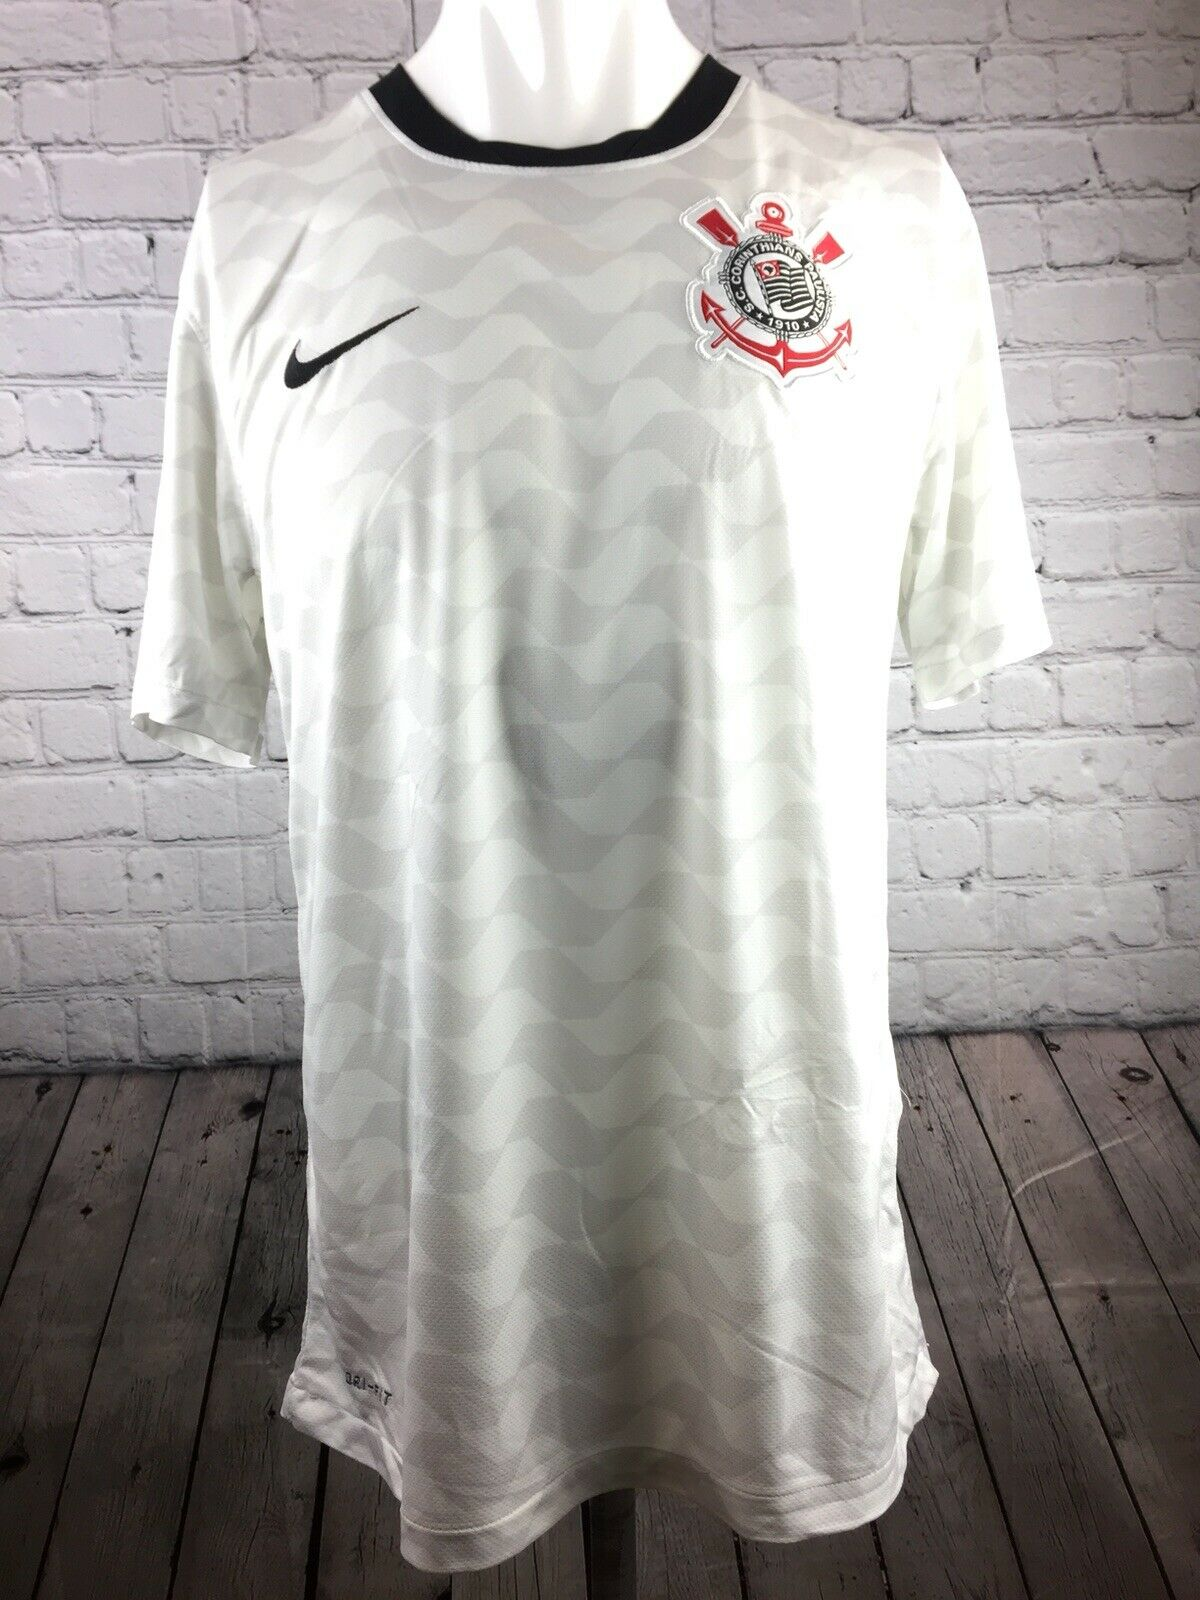 Corinthians paulista Camiseta De Fútbol Home  Kit de tamaño mediano. Brasil 9 Nike en muy buena condición.  marca